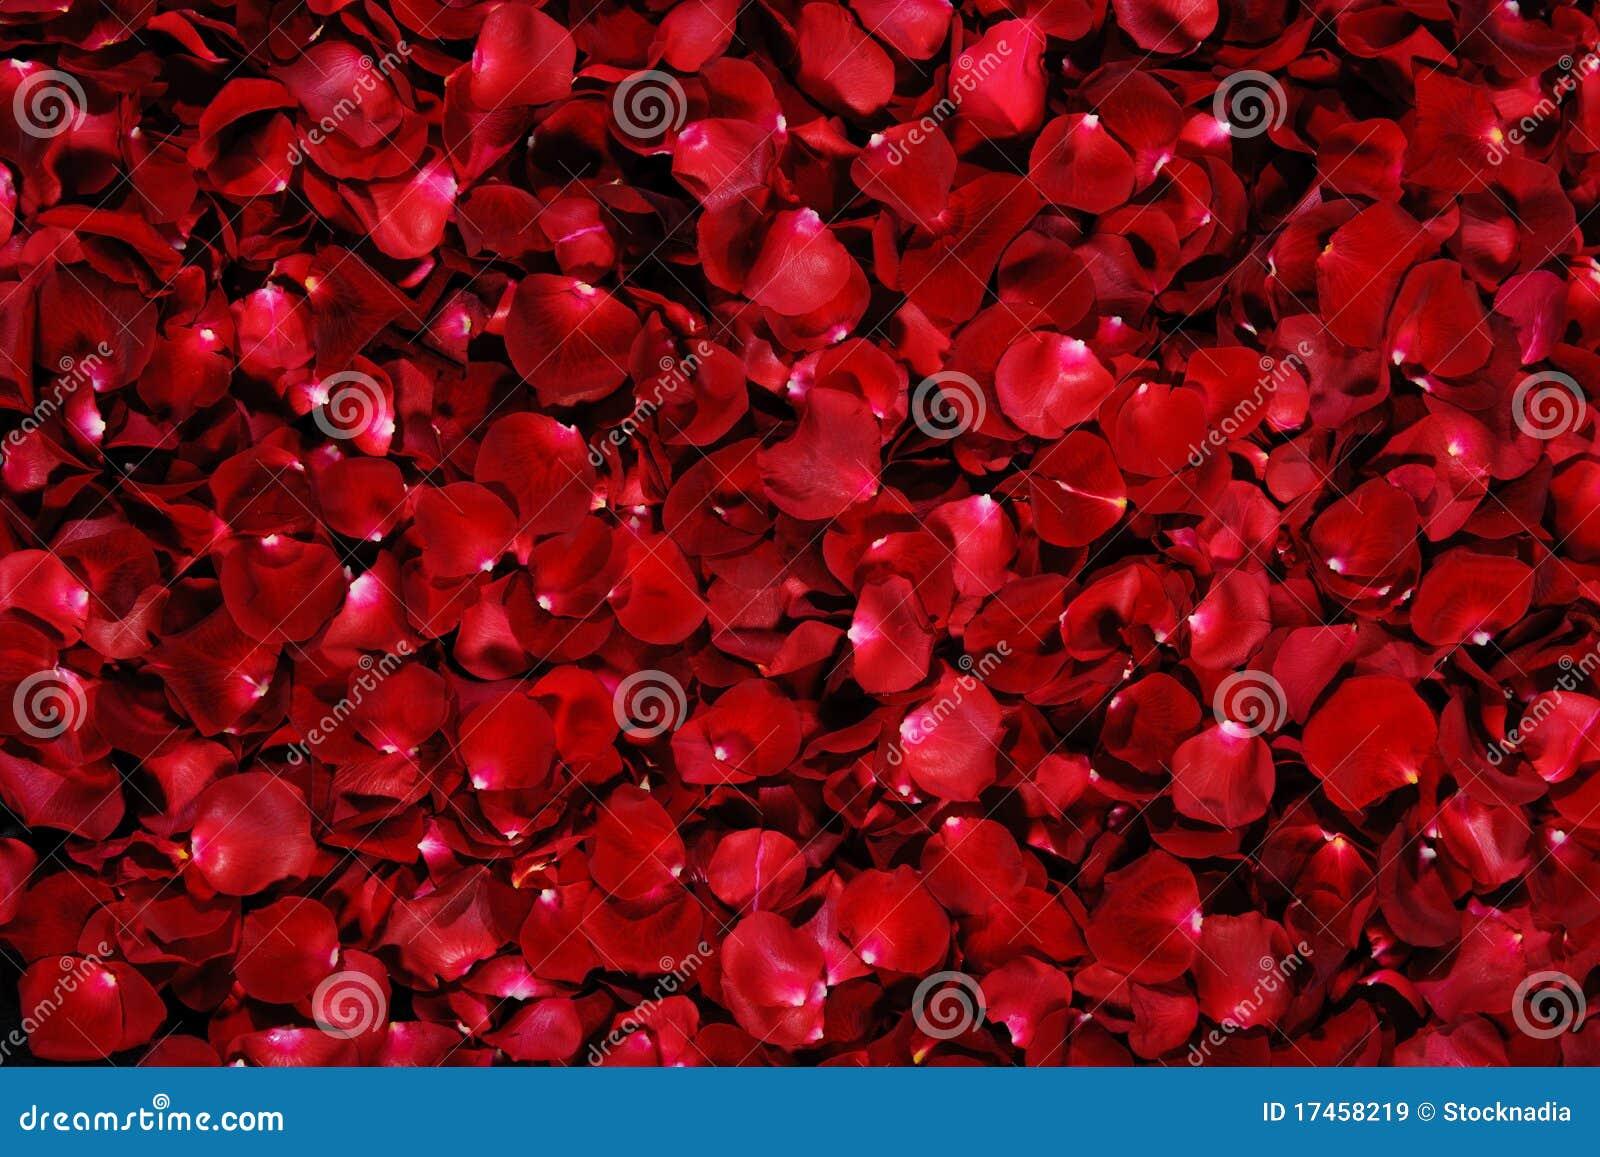 Rote rosafarbene Blumenblätter